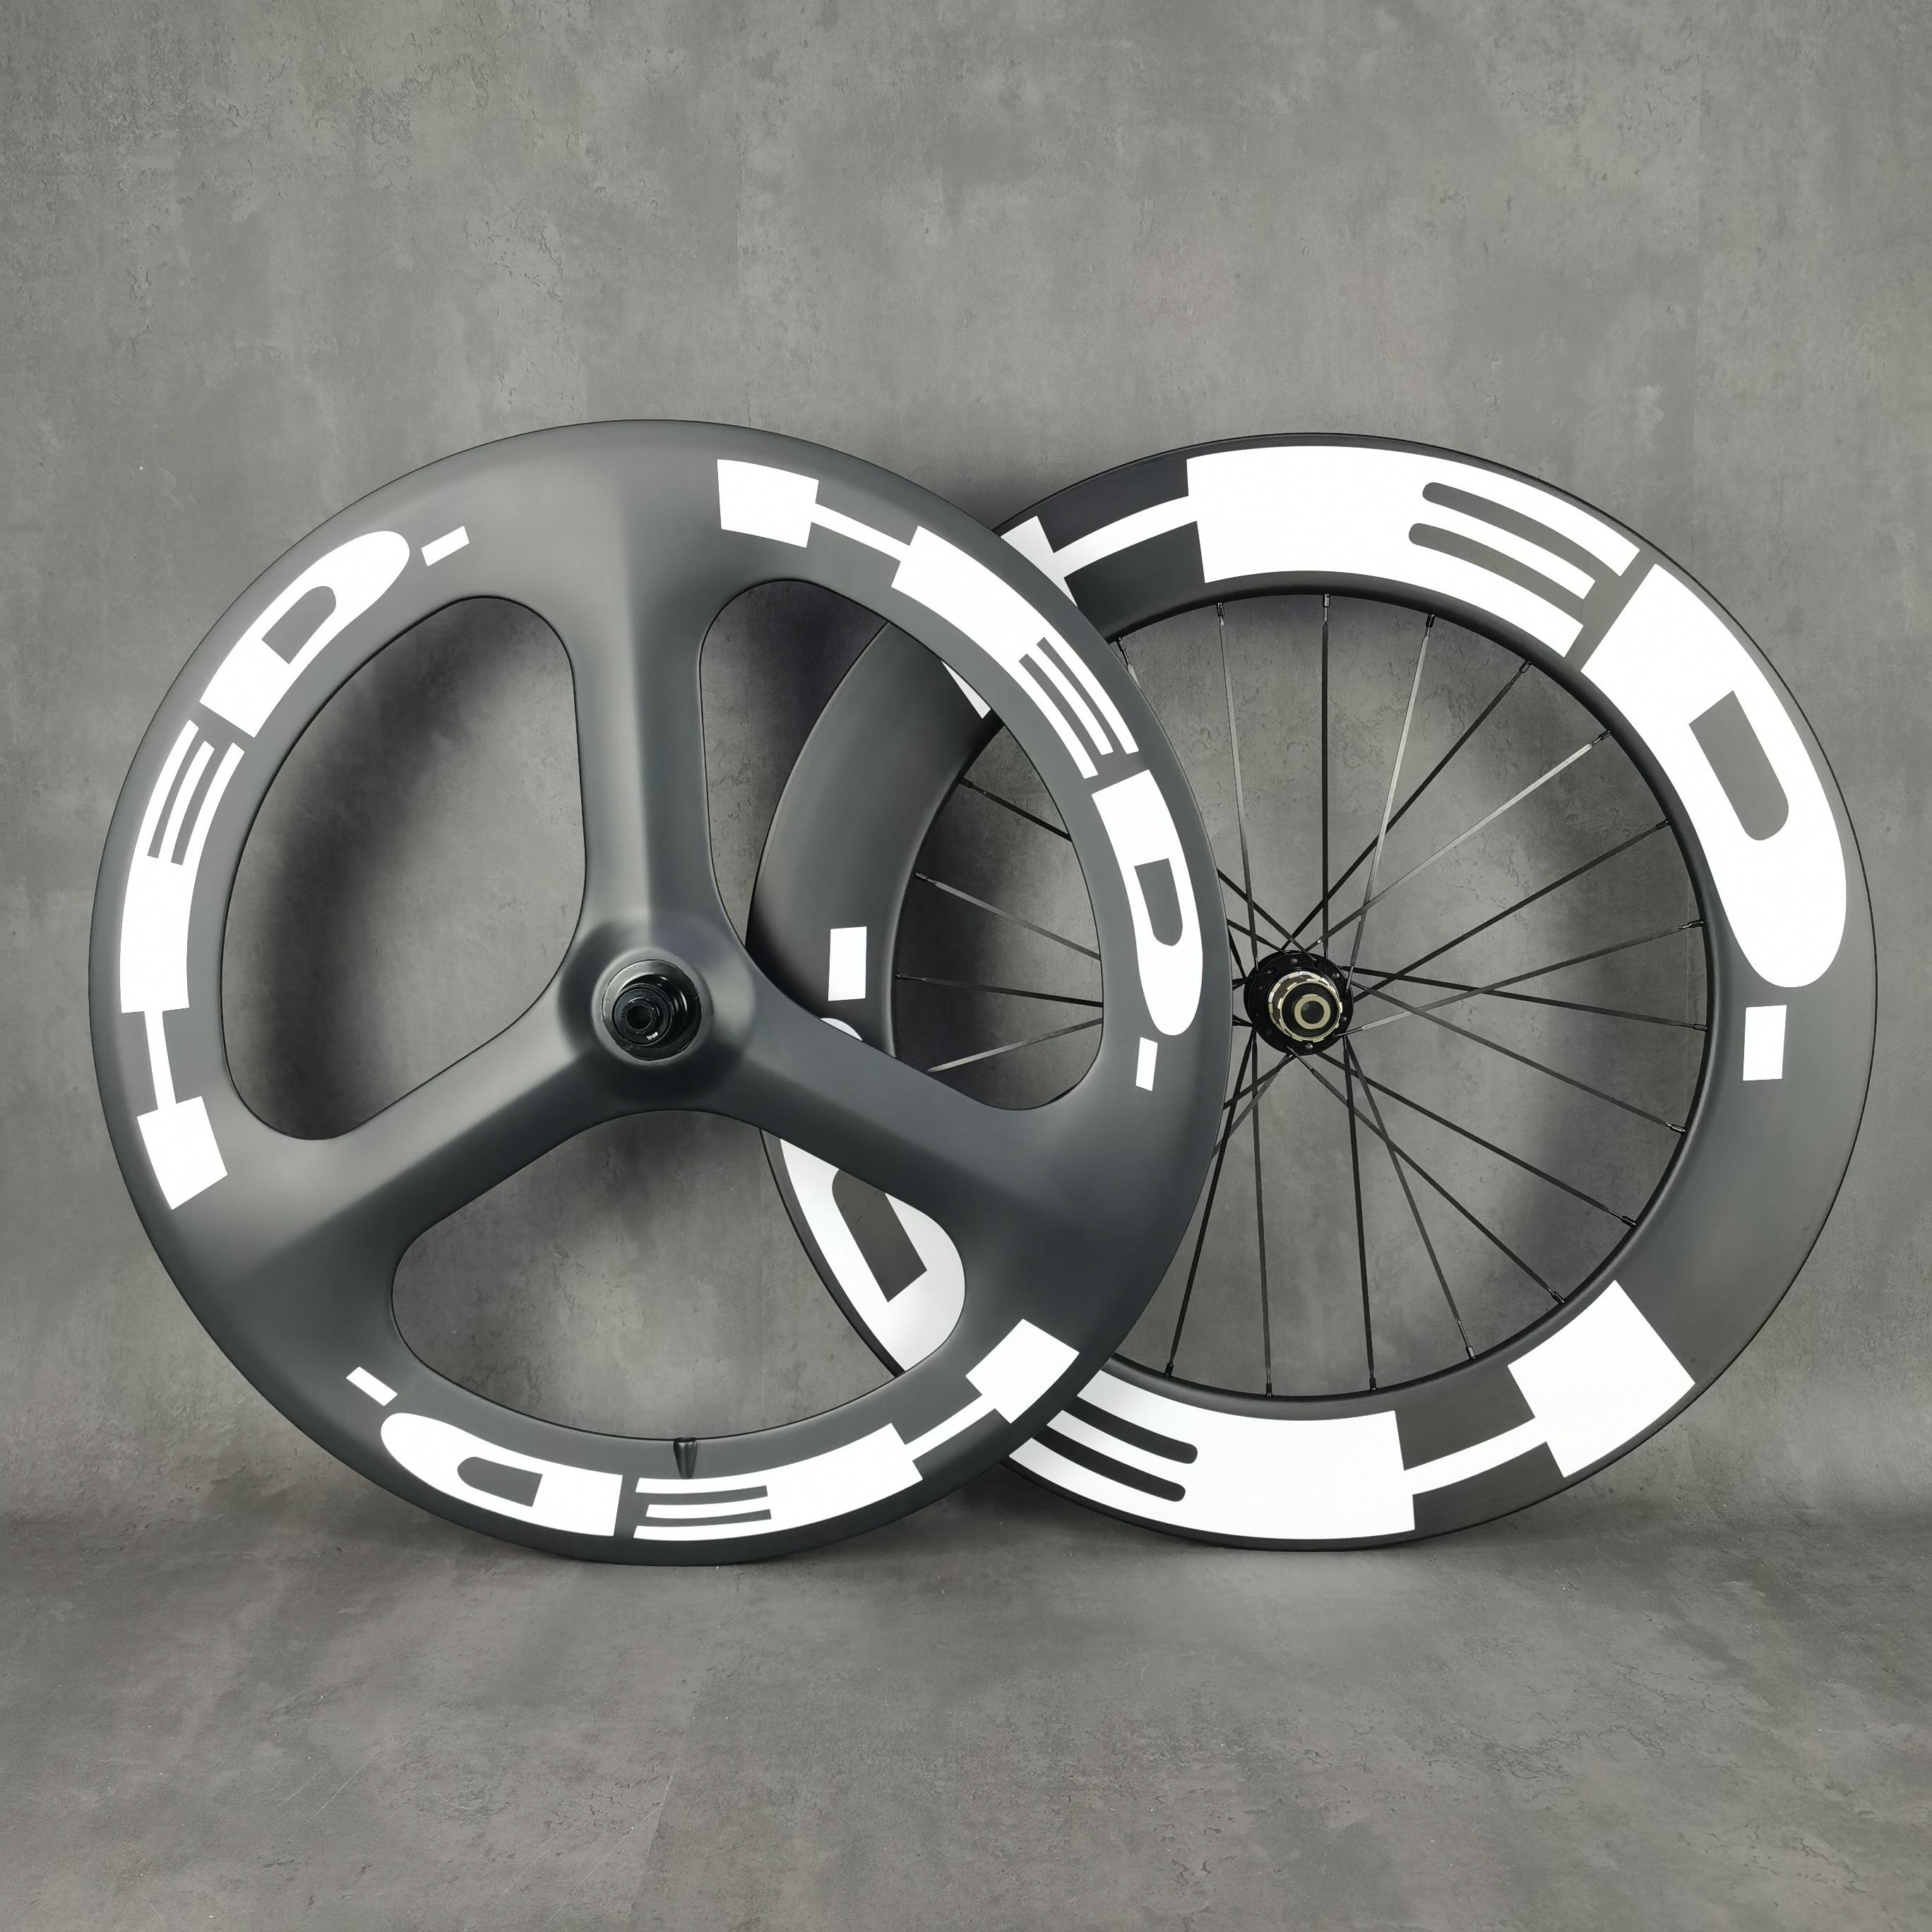 HED 700C الكربون العجلات العجلات ROAS DRIP TRI-تكلم الخلفي 88MM عجلة المسار / الطريق العجلات الفاصلة / tuabular مع UD ماتي النهاية novatec792 hub